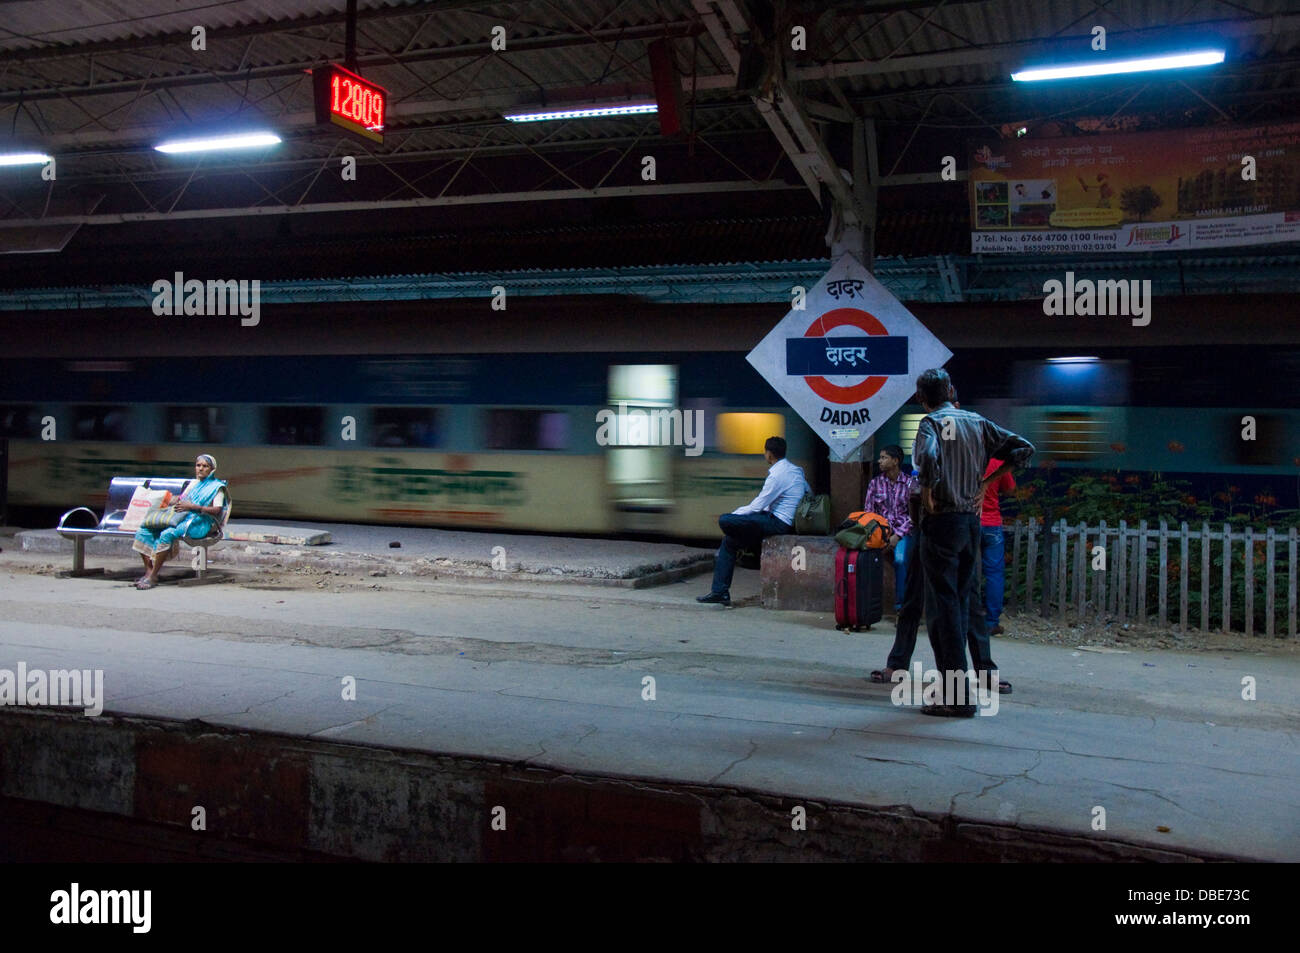 Dadar railway station Stock Photo